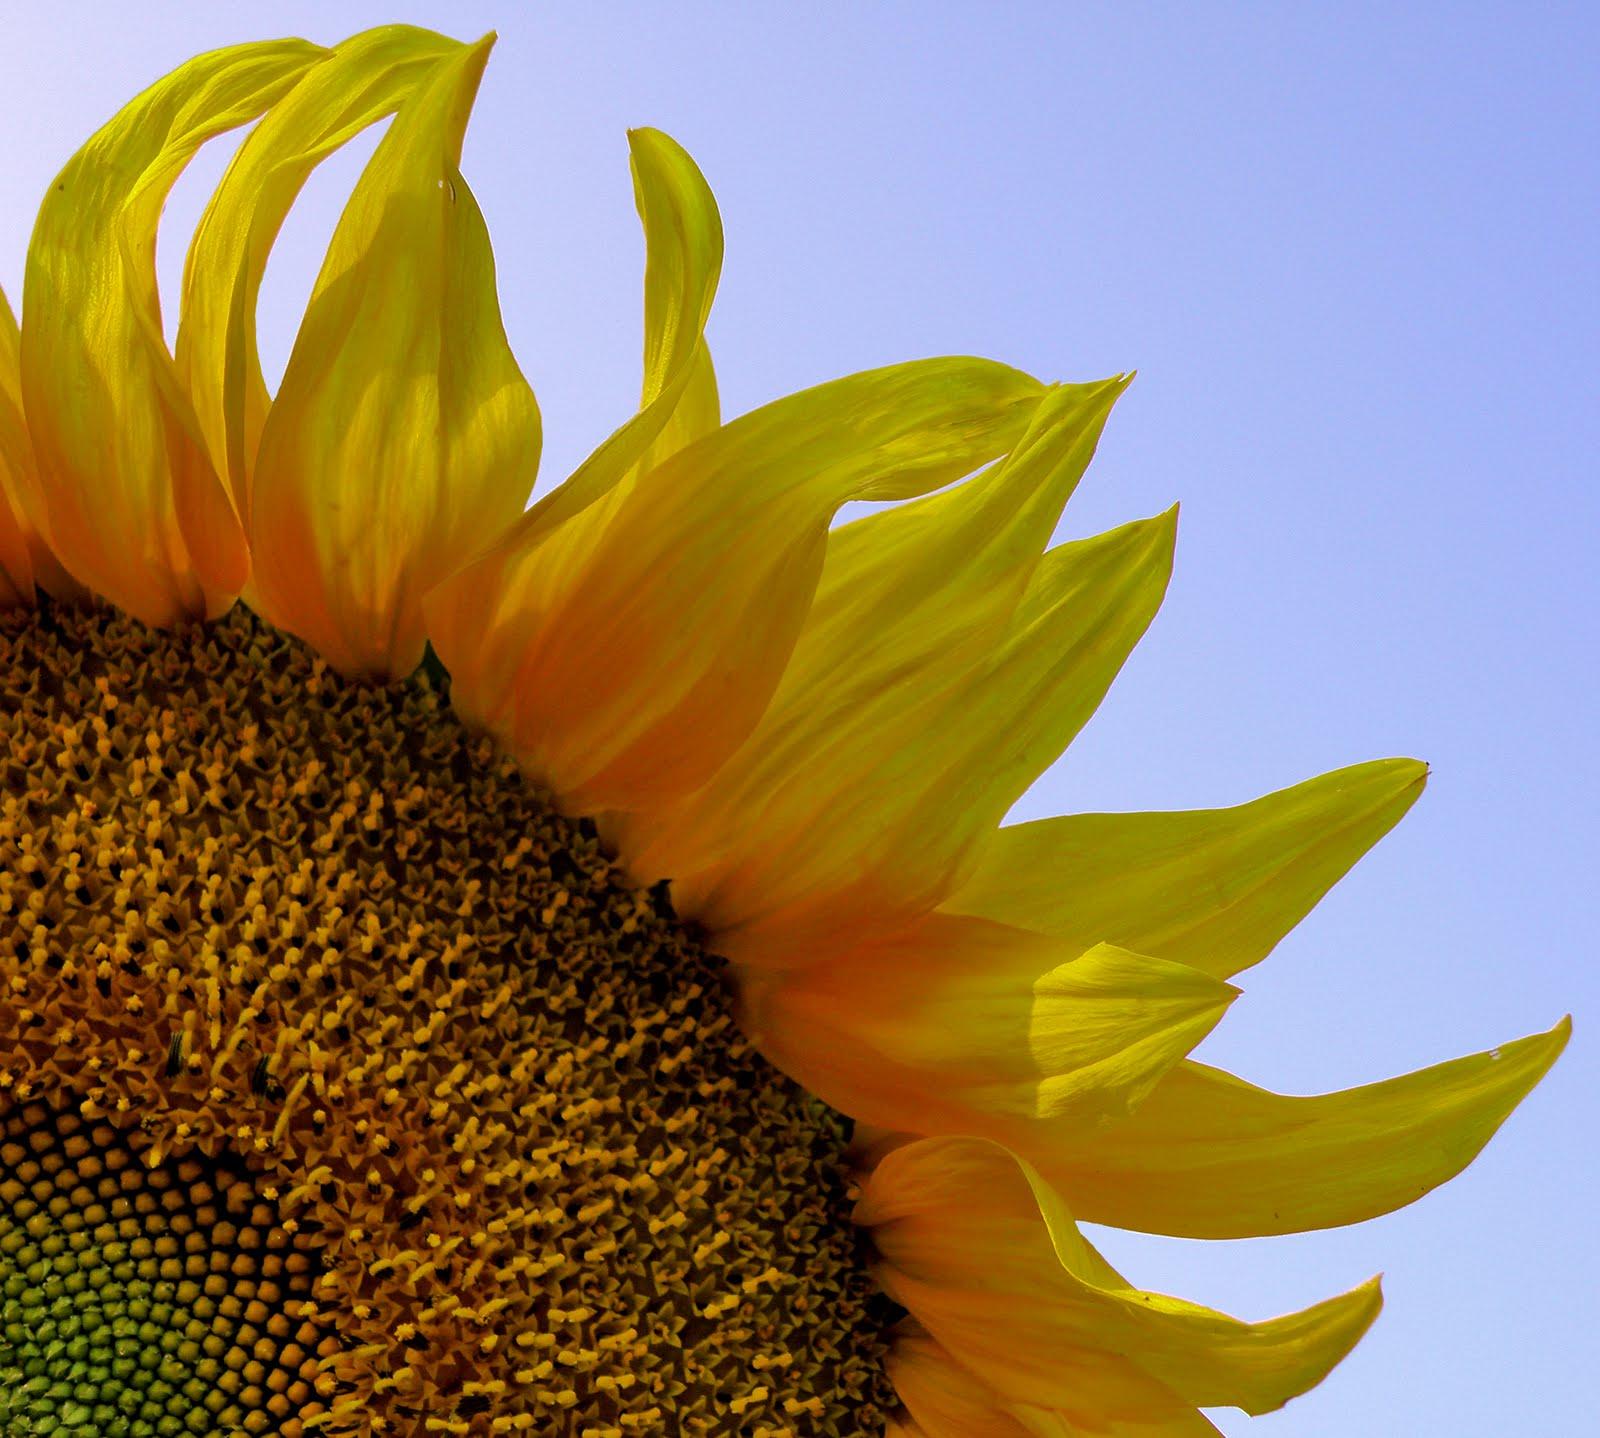 http://1.bp.blogspot.com/_pGKKSeIs0ow/TExHgjHkoSI/AAAAAAAABAA/J9JXTR0ytc0/s1600/Sunflower_-_slonecznik_(2).jpg